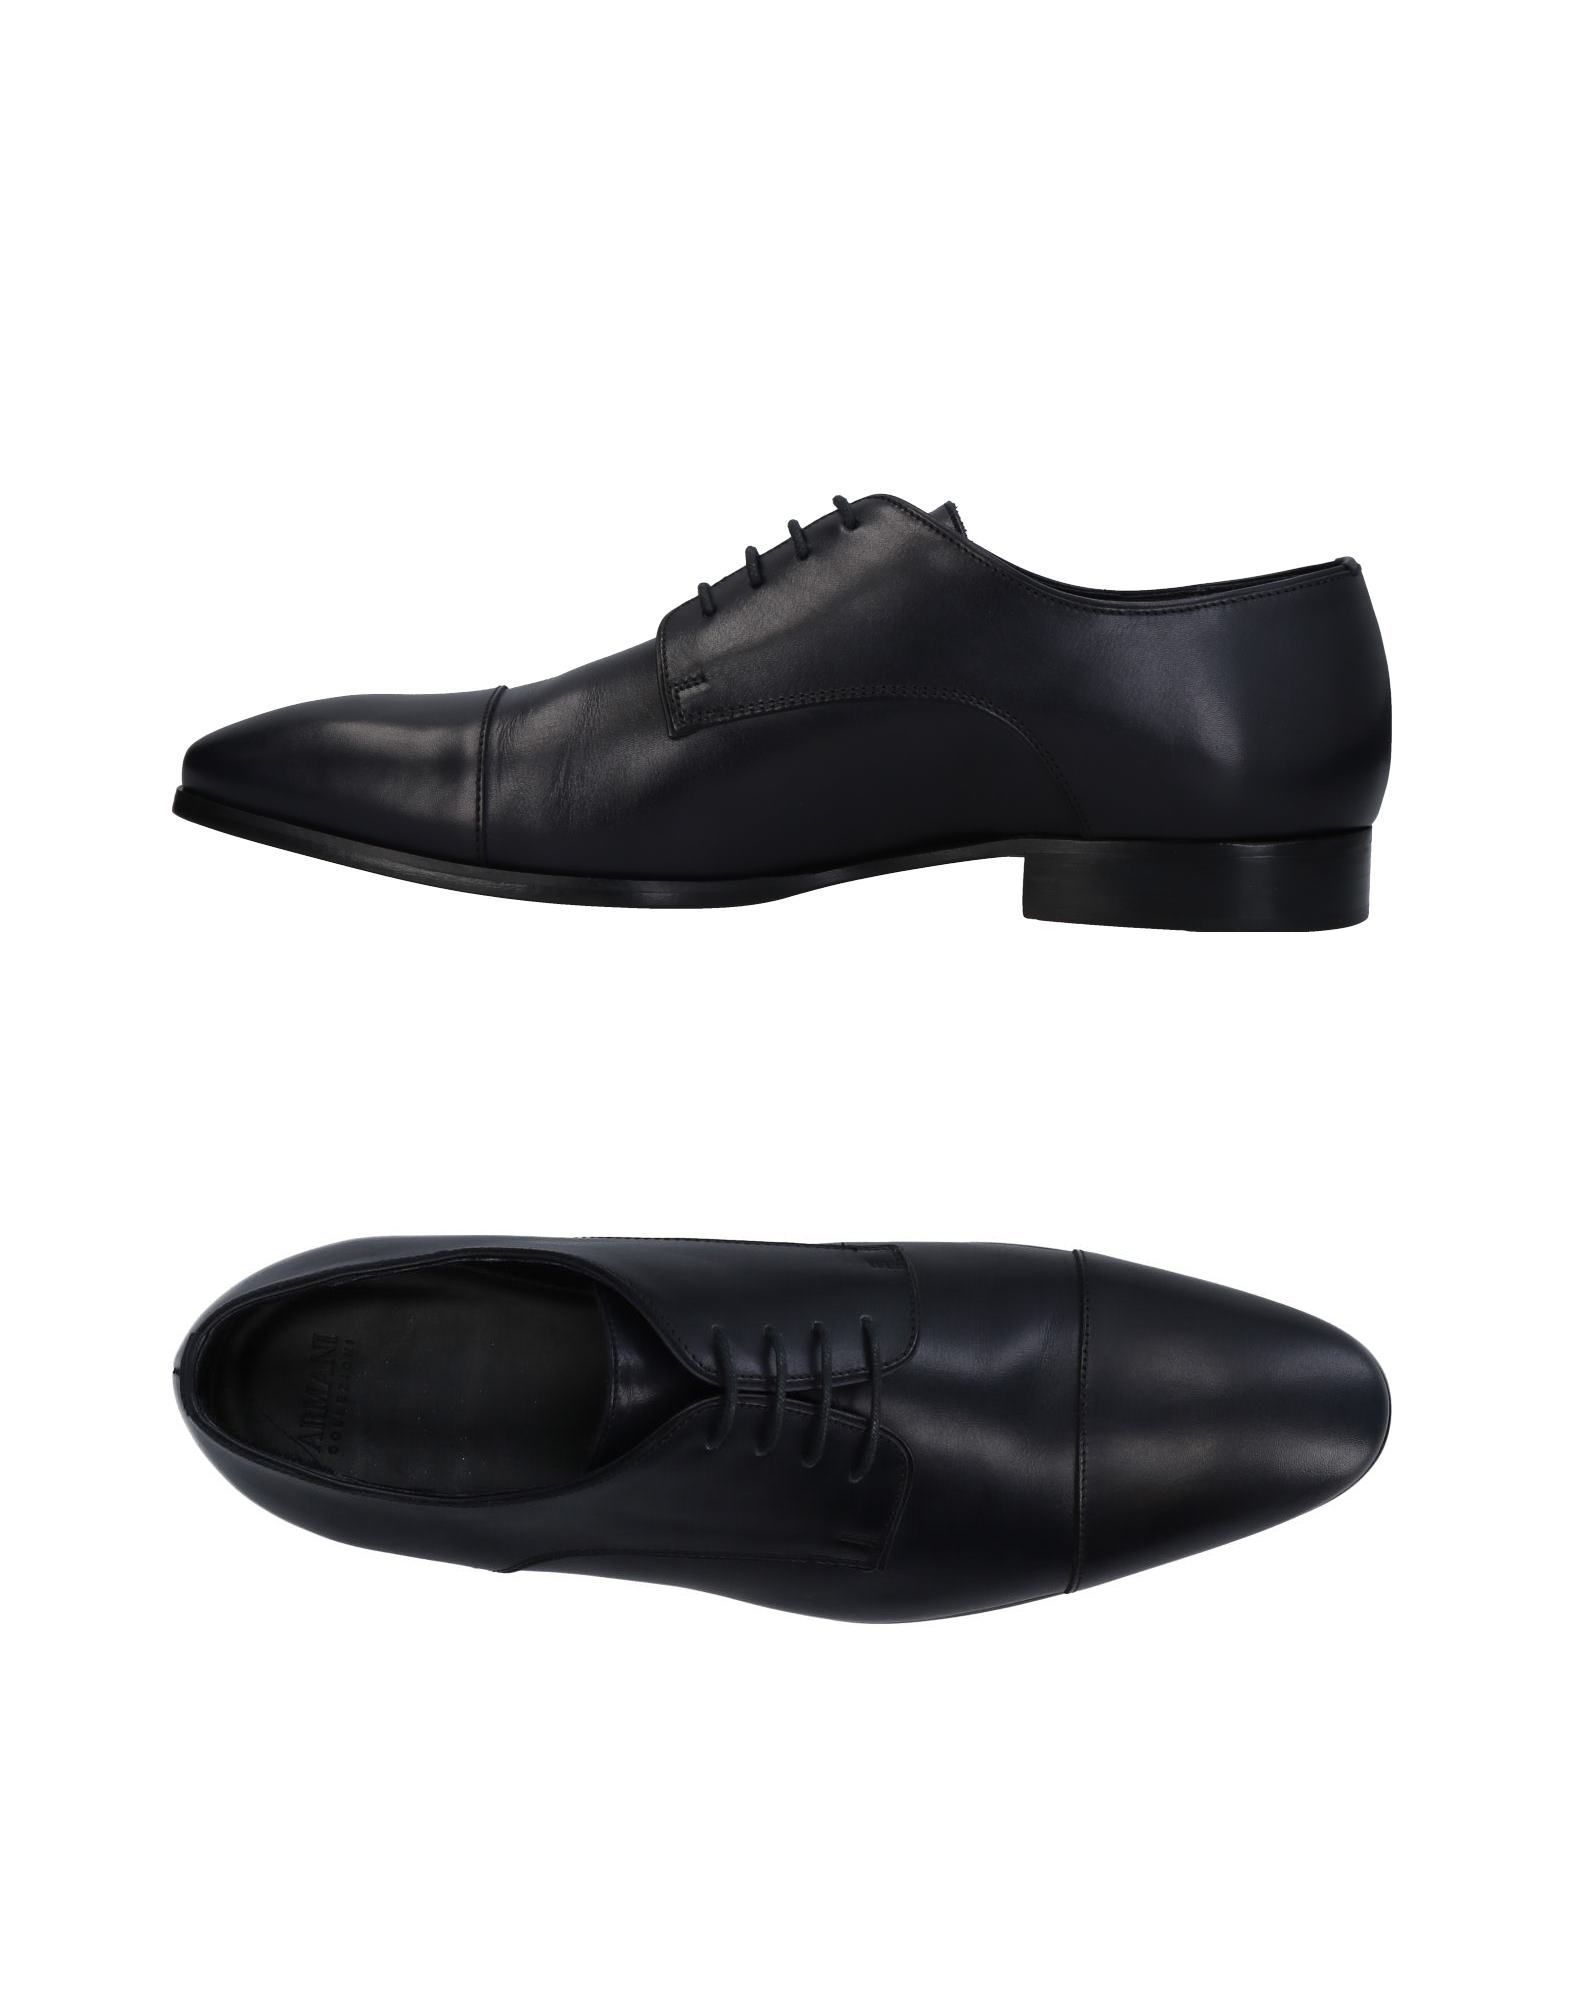 Фото - ARMANI COLLEZIONI Обувь на шнурках обувь на высокой платформе dkny